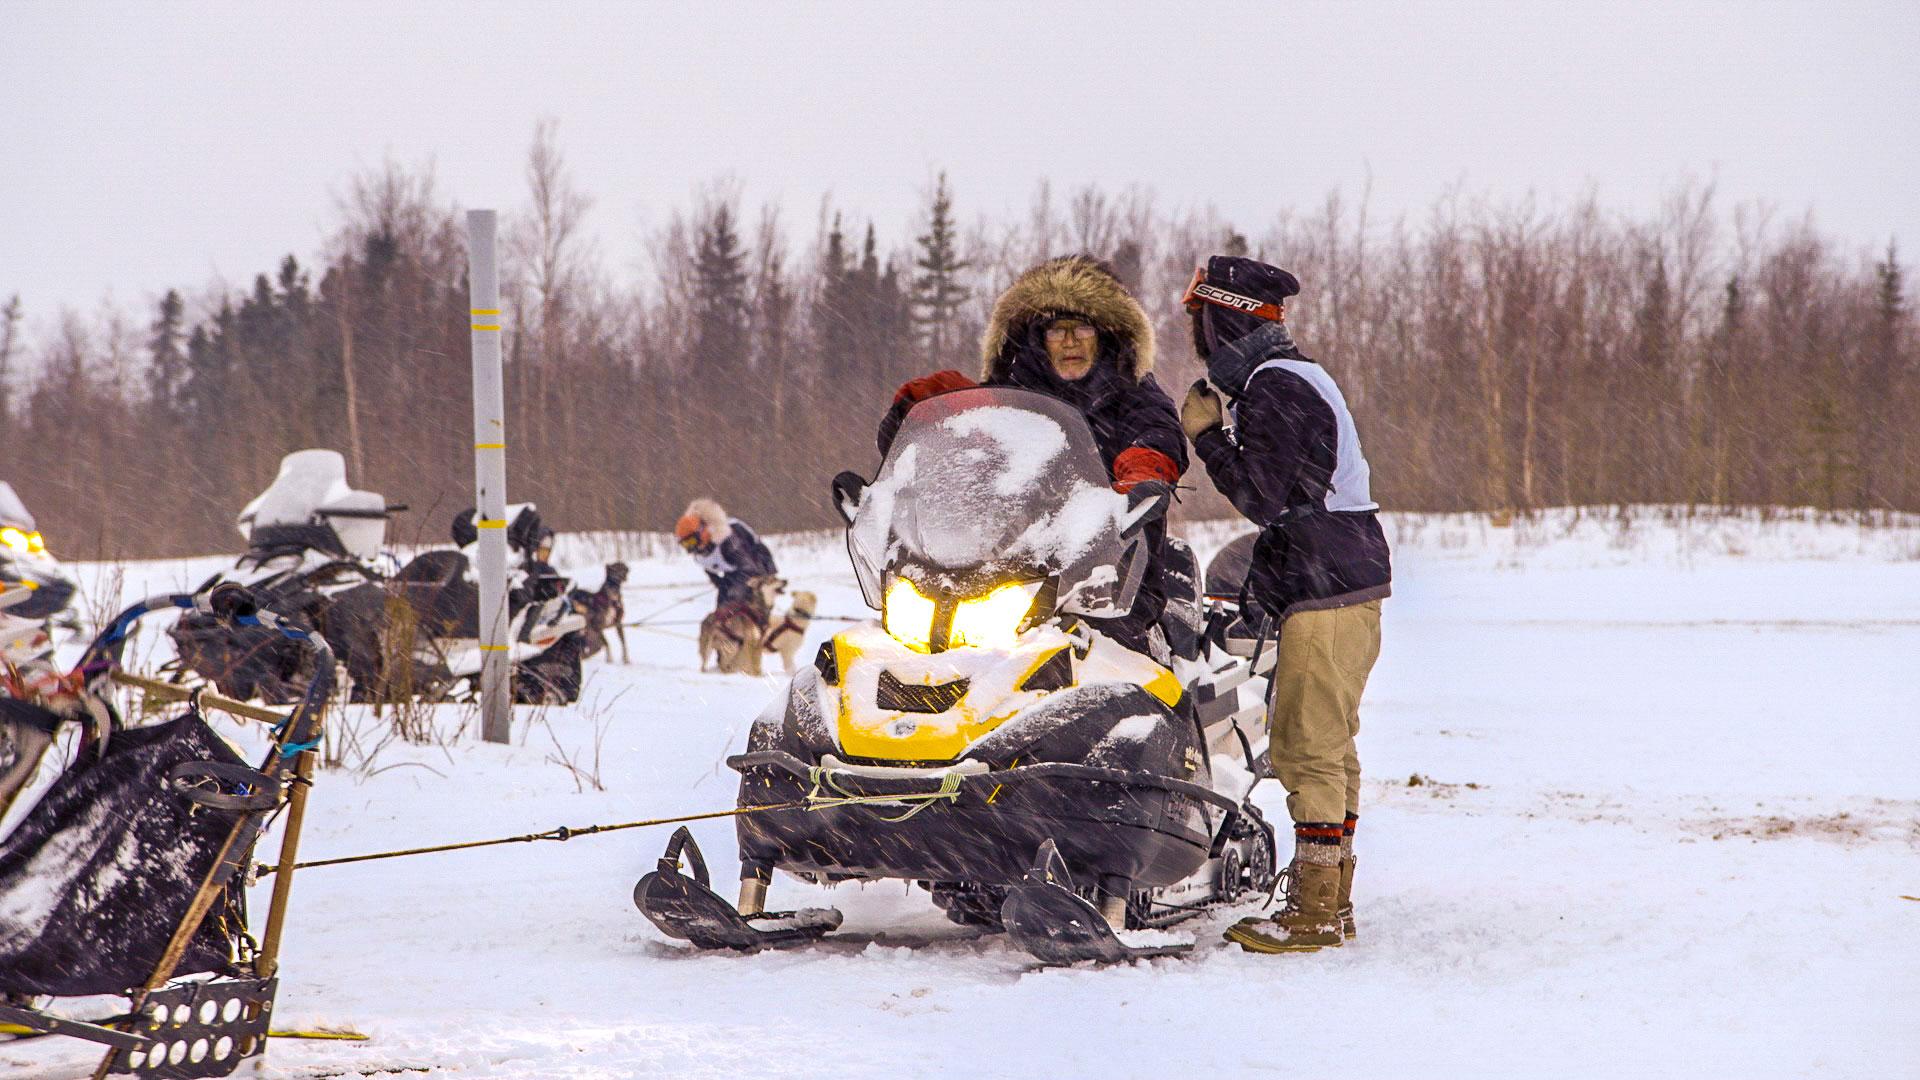 An elderly George Attla rides a snowmobile